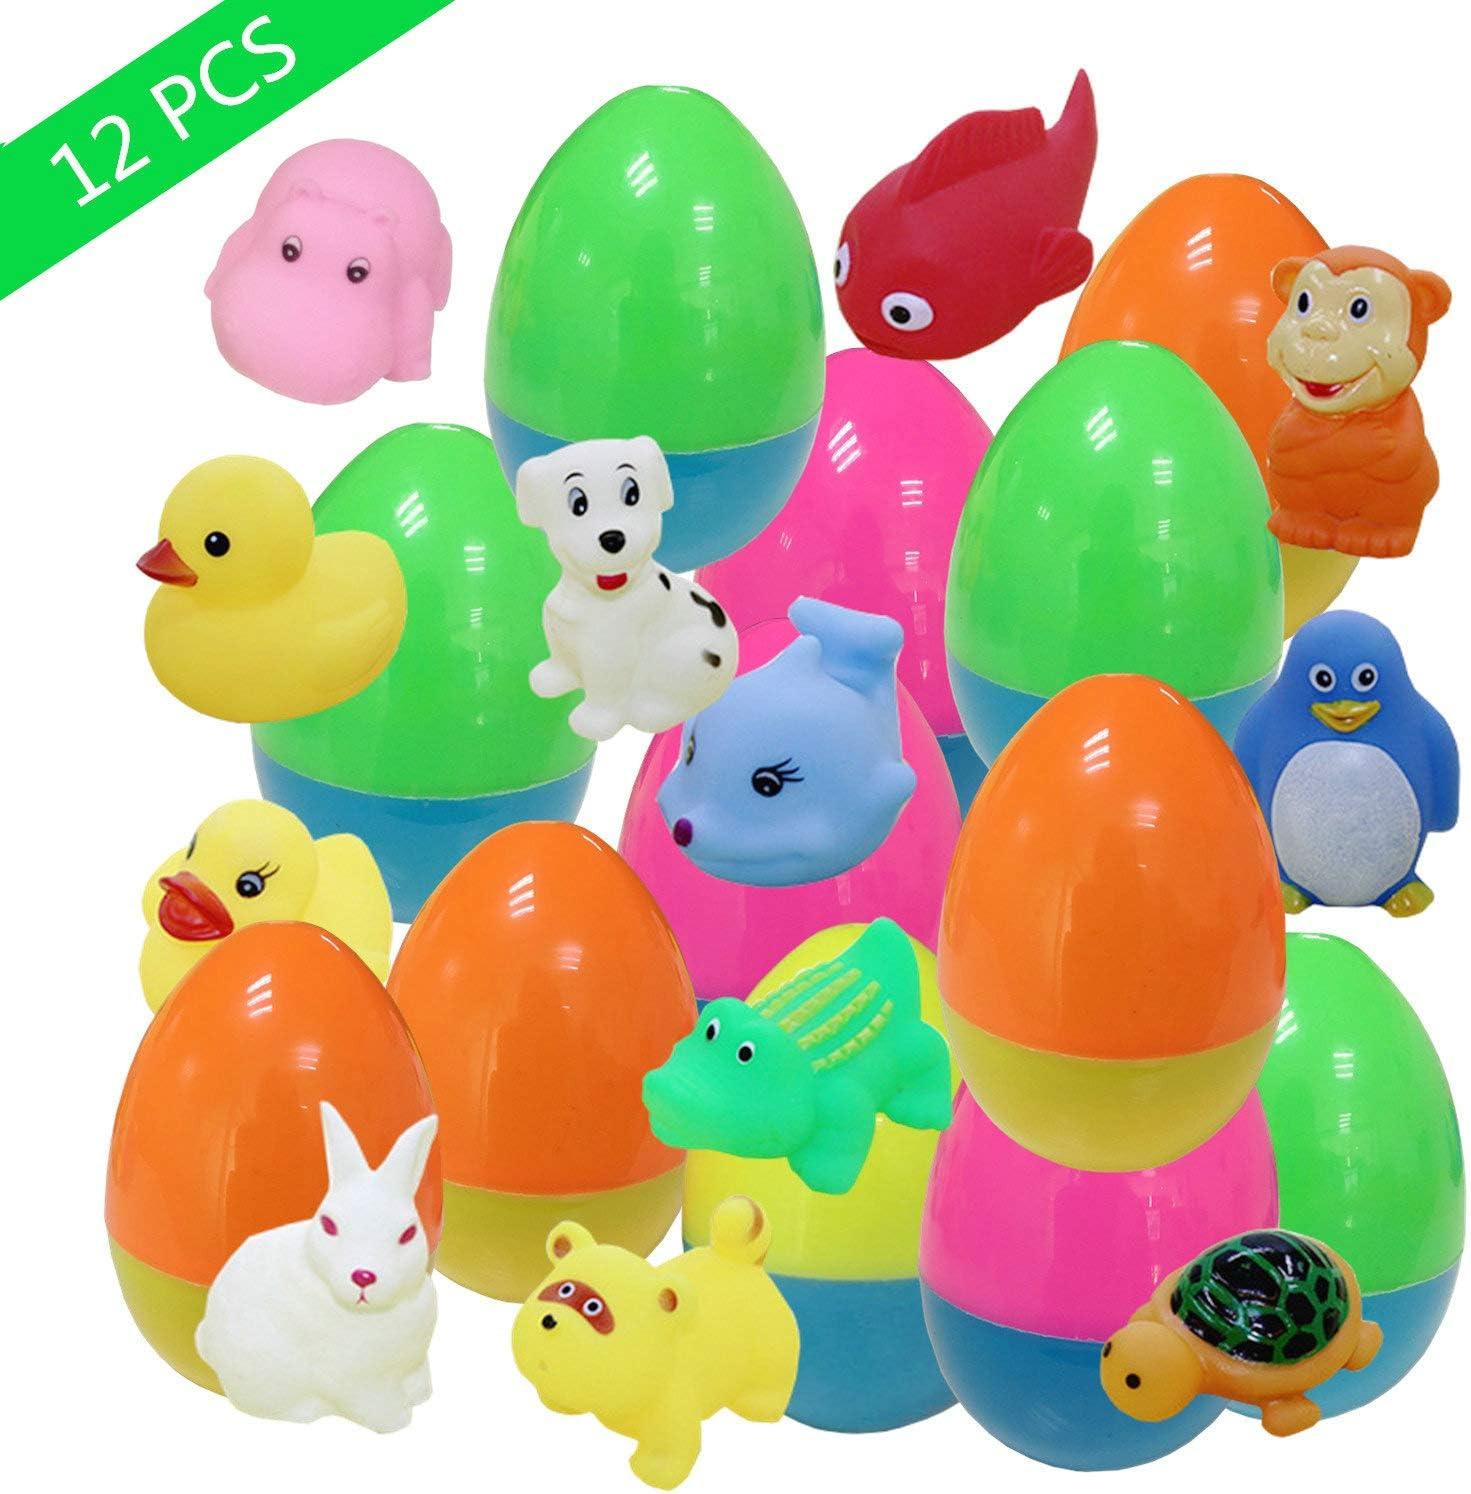 Easter Basket Stuffers Gifts Toy for Toddlers Kids Boys Girls KAZOKU 12 Pack Prefilled Plastic Easter Eggs Filled with Toys Inside for Bulk Easter Egg Hunt Games